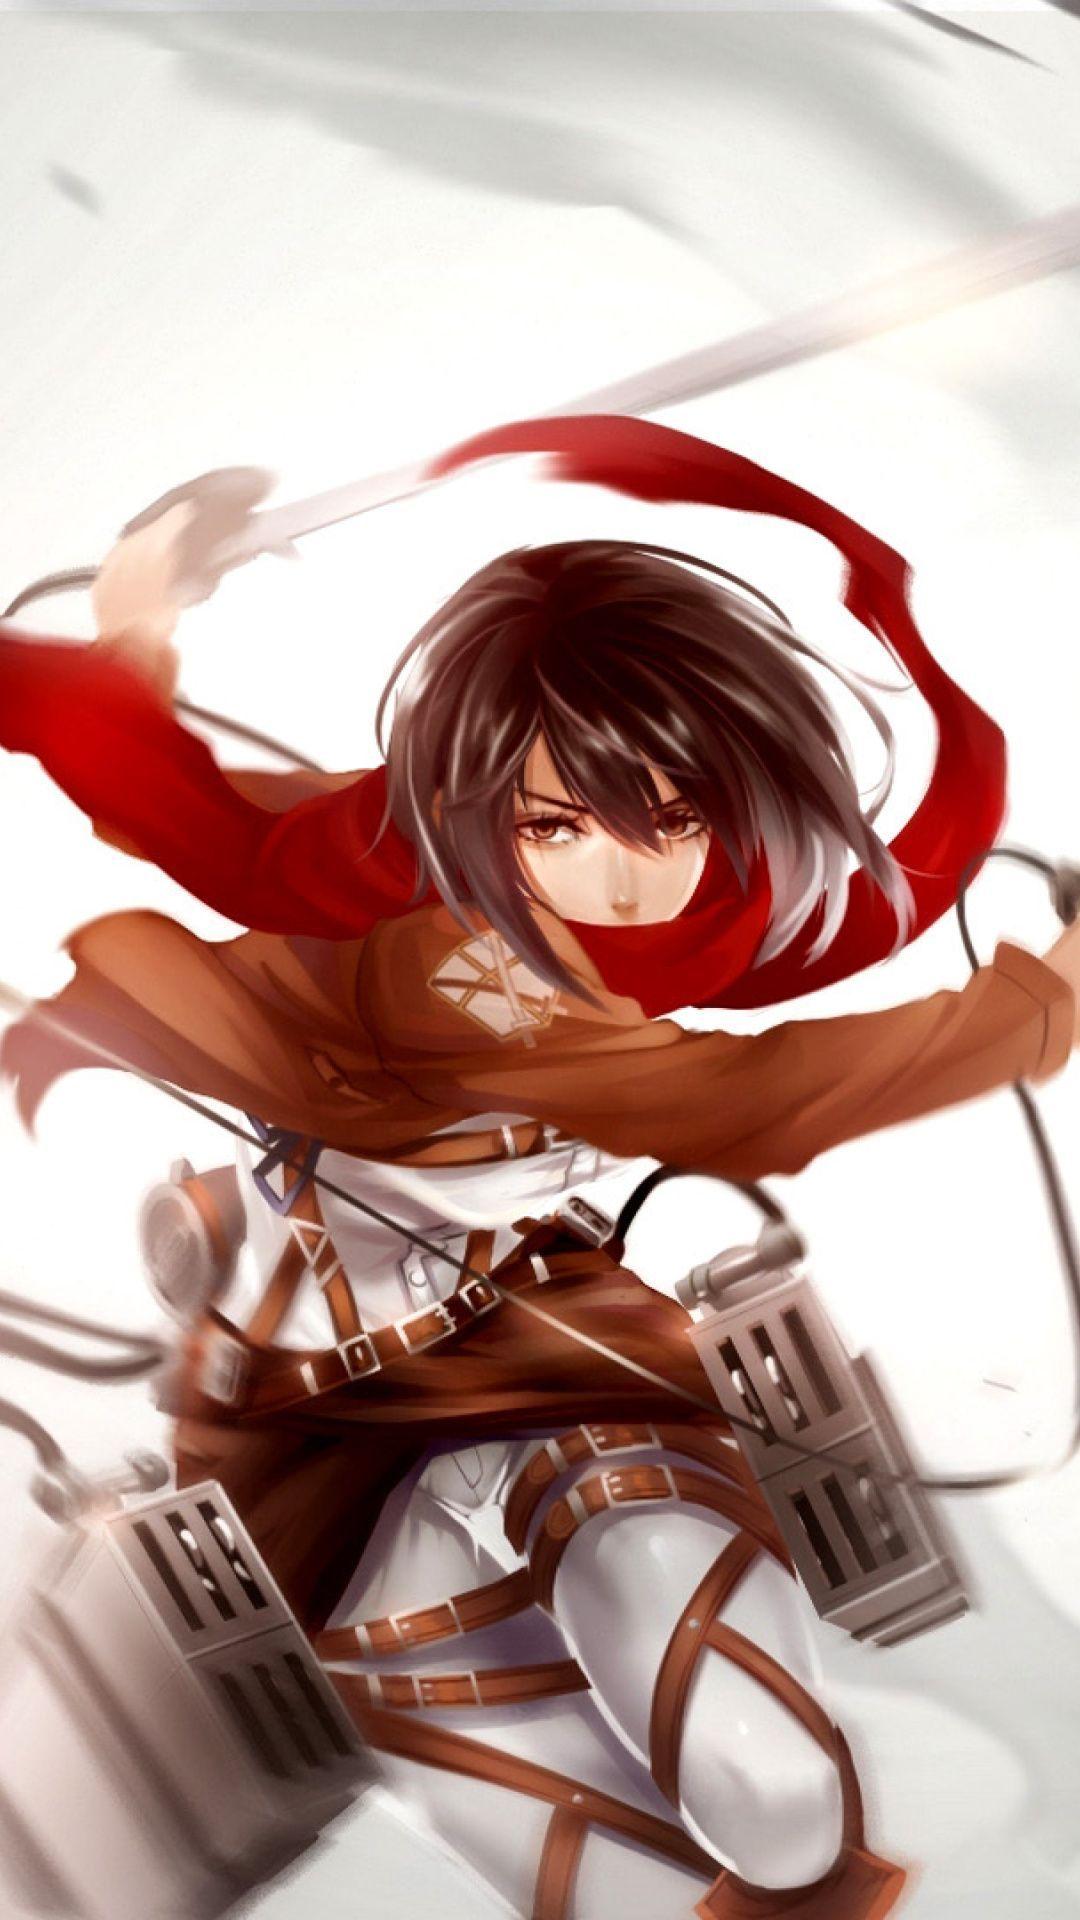 Annie leonhart, levi ackerman, shingeki no kyojin,. Anime Attack On Titan Mikasa Wallpapers - Wallpaper Cave